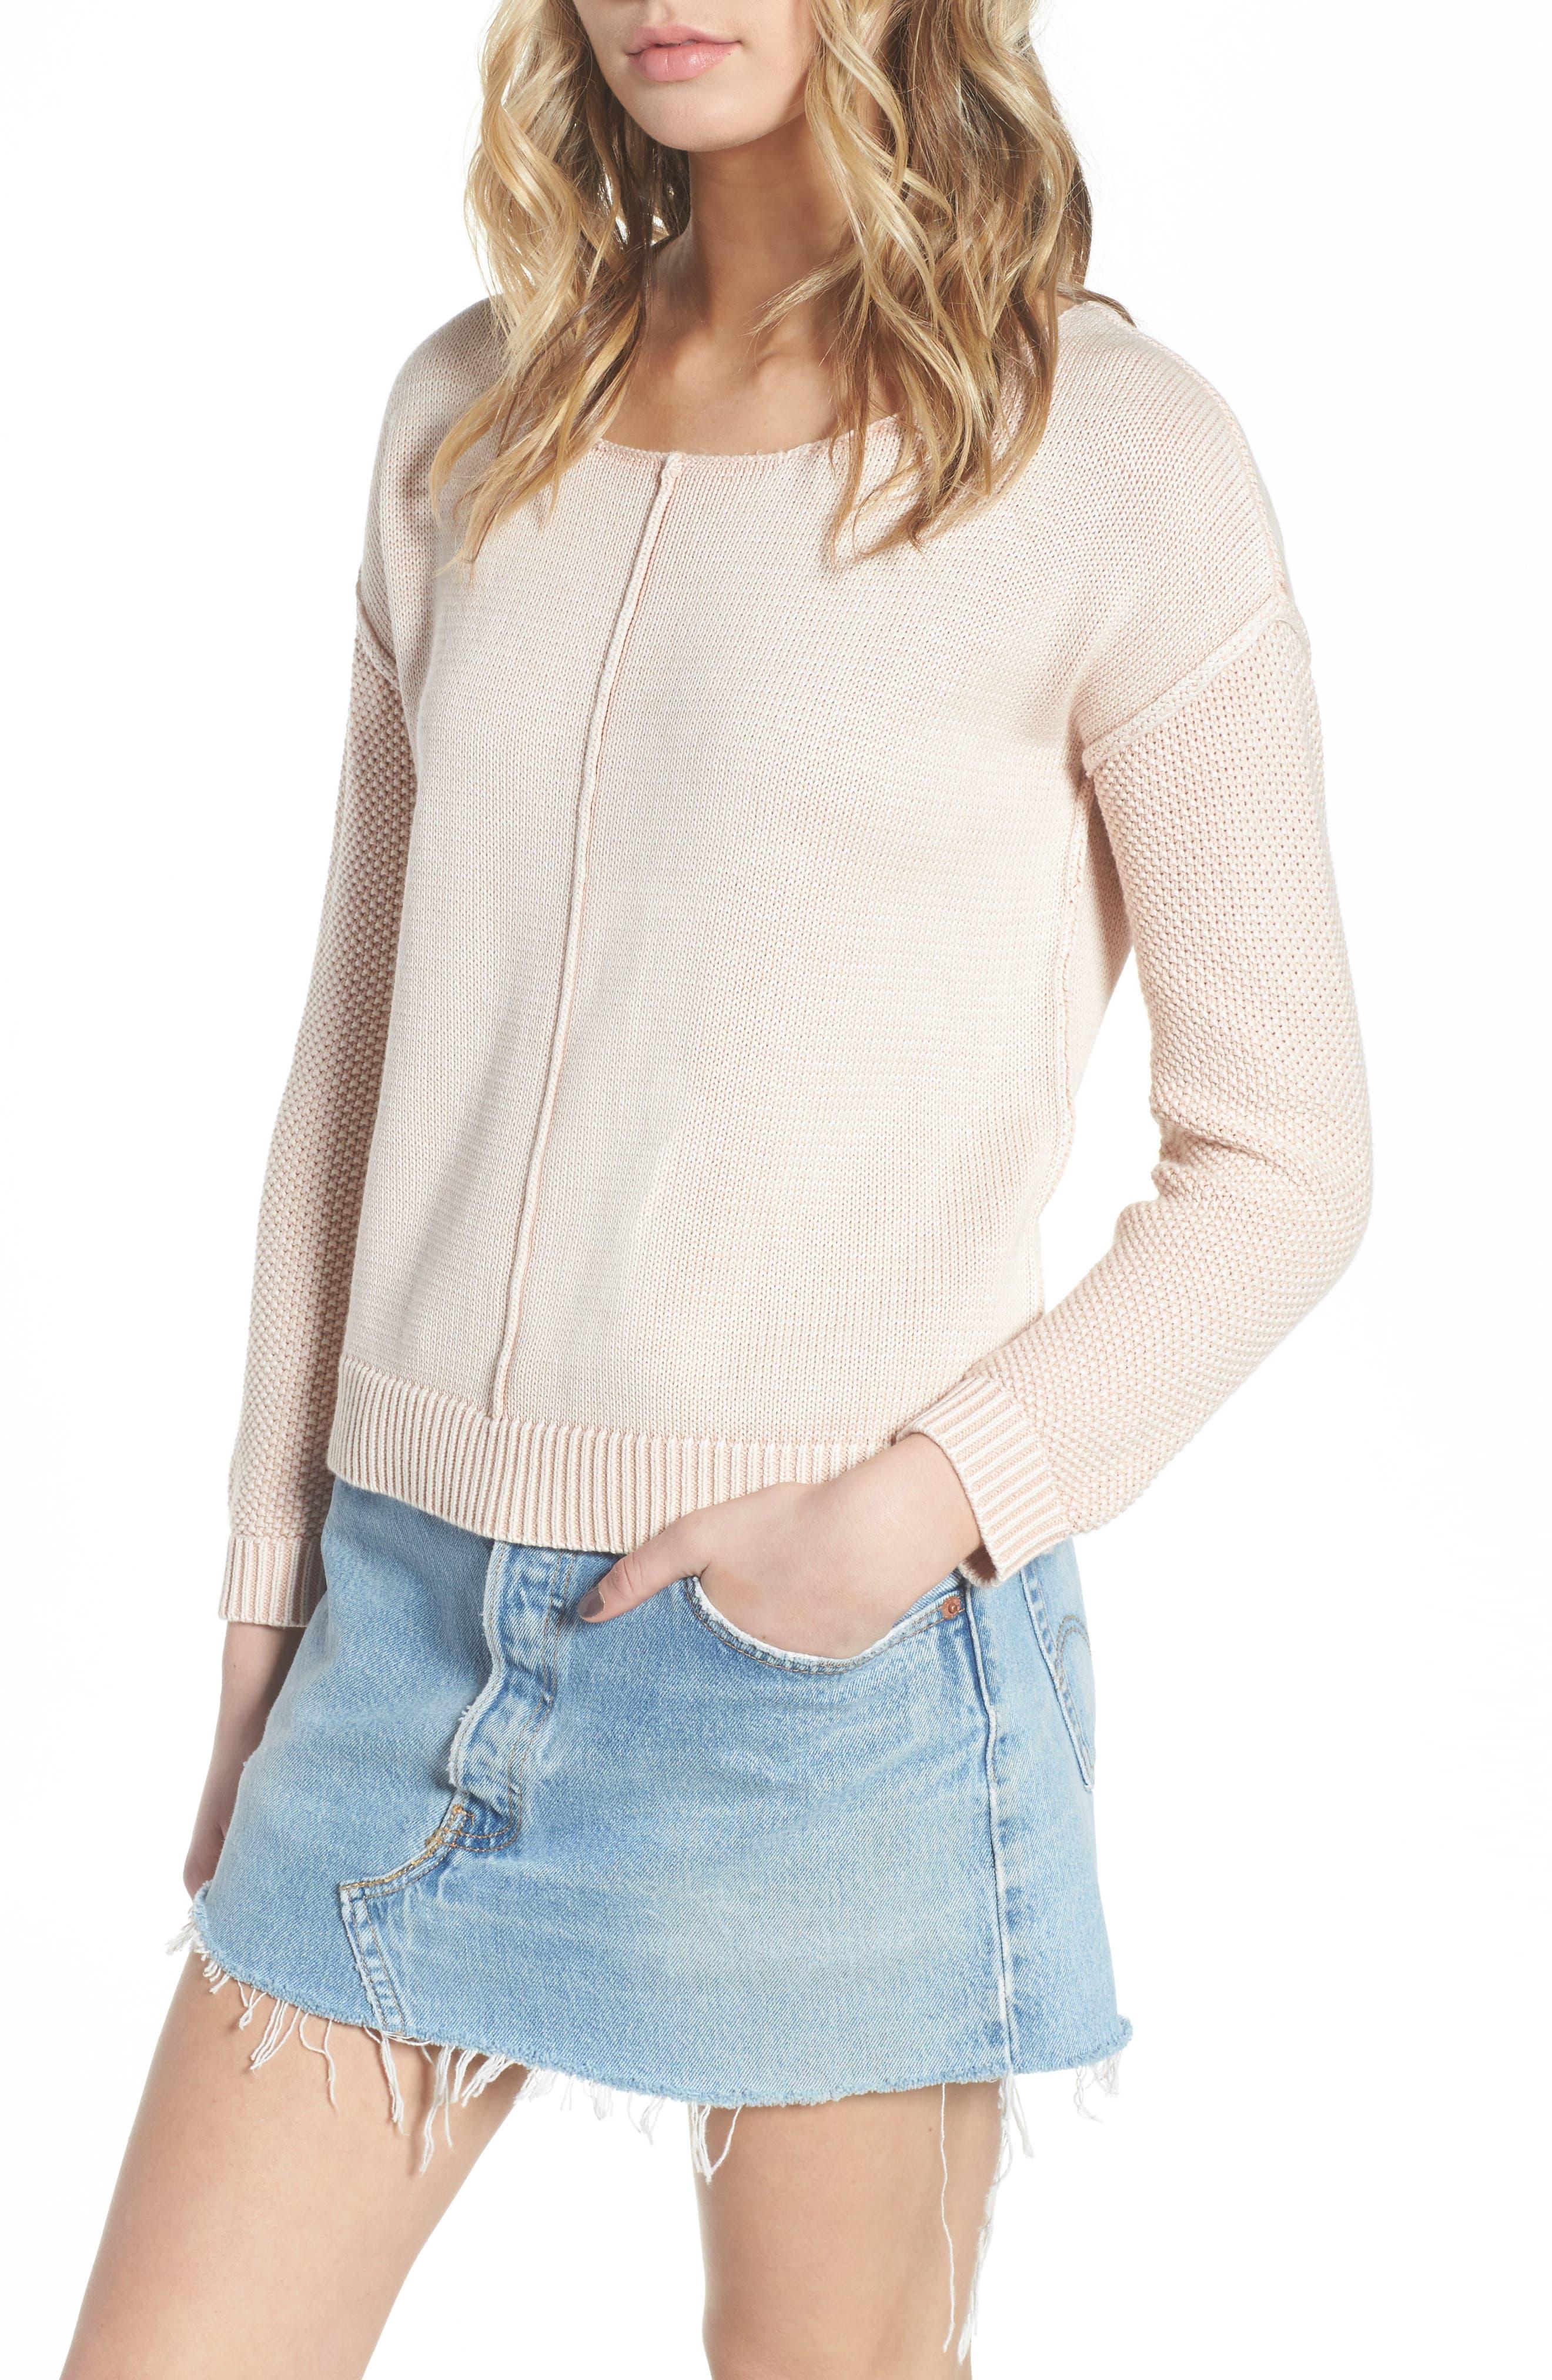 Erin Knit Sweater,                         Main,                         color, Sand Washed Blush